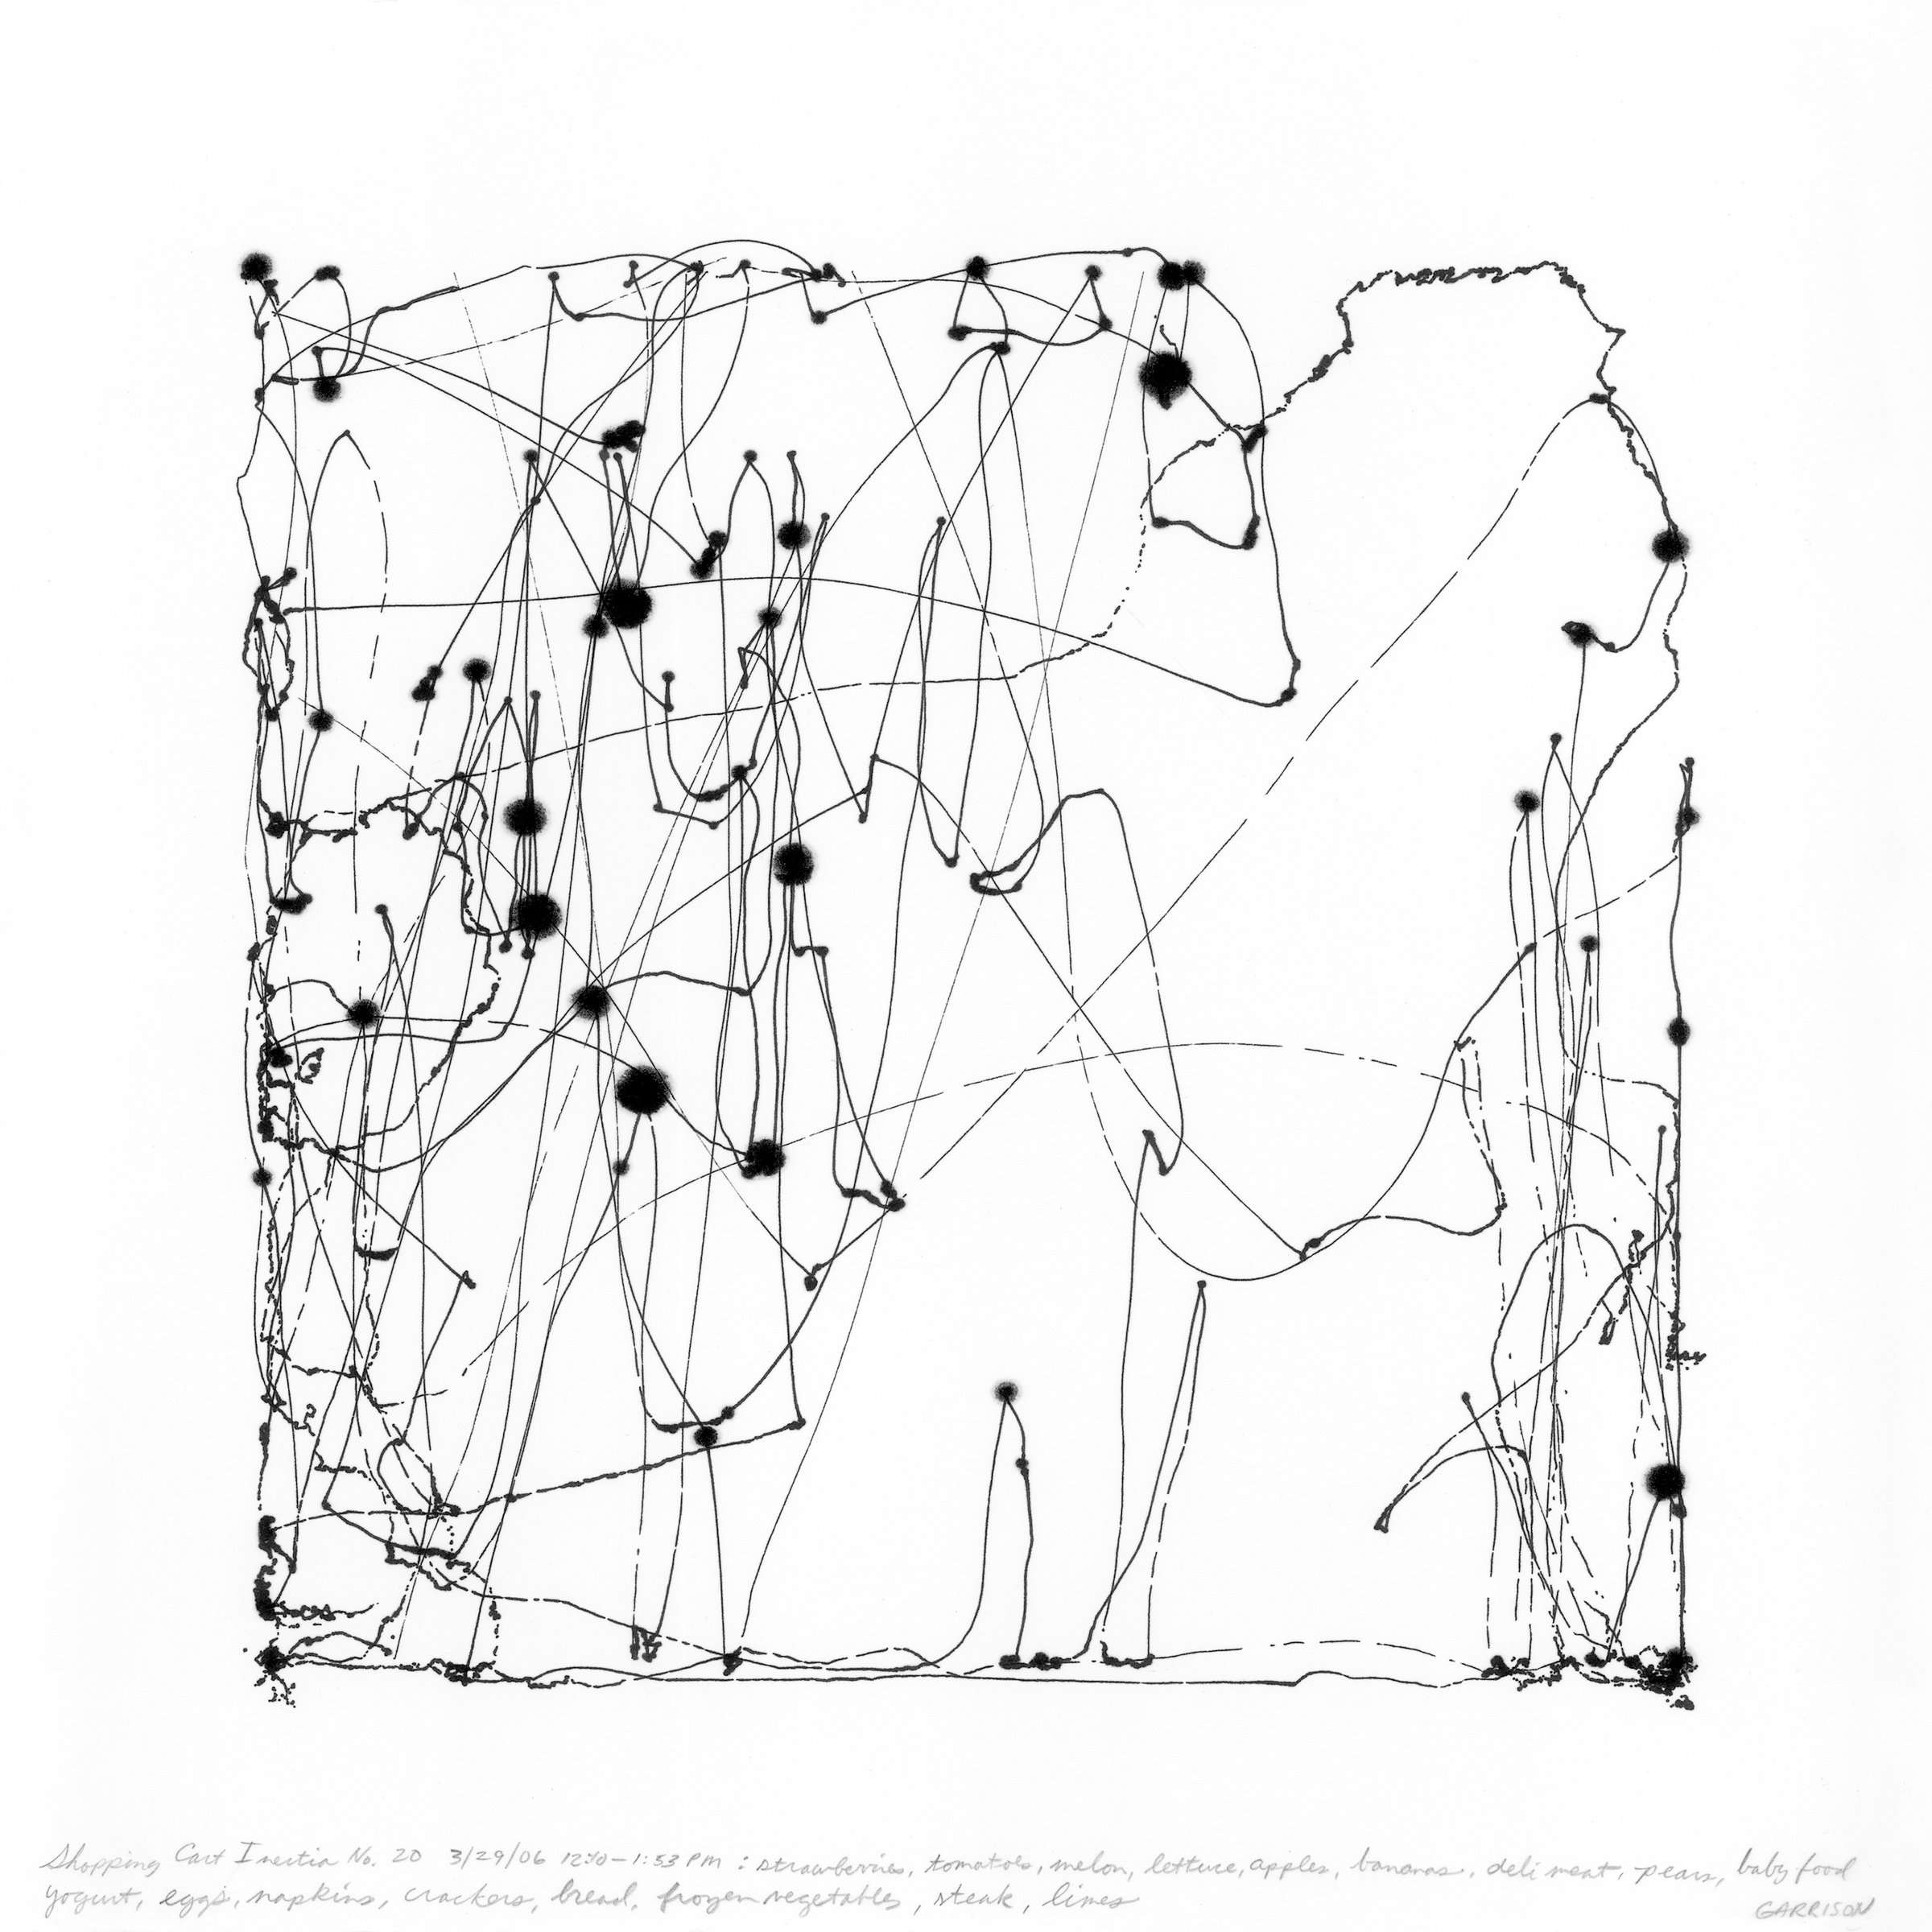 Richard Garrison, Shopping Cart Inertia No. 20, 2006